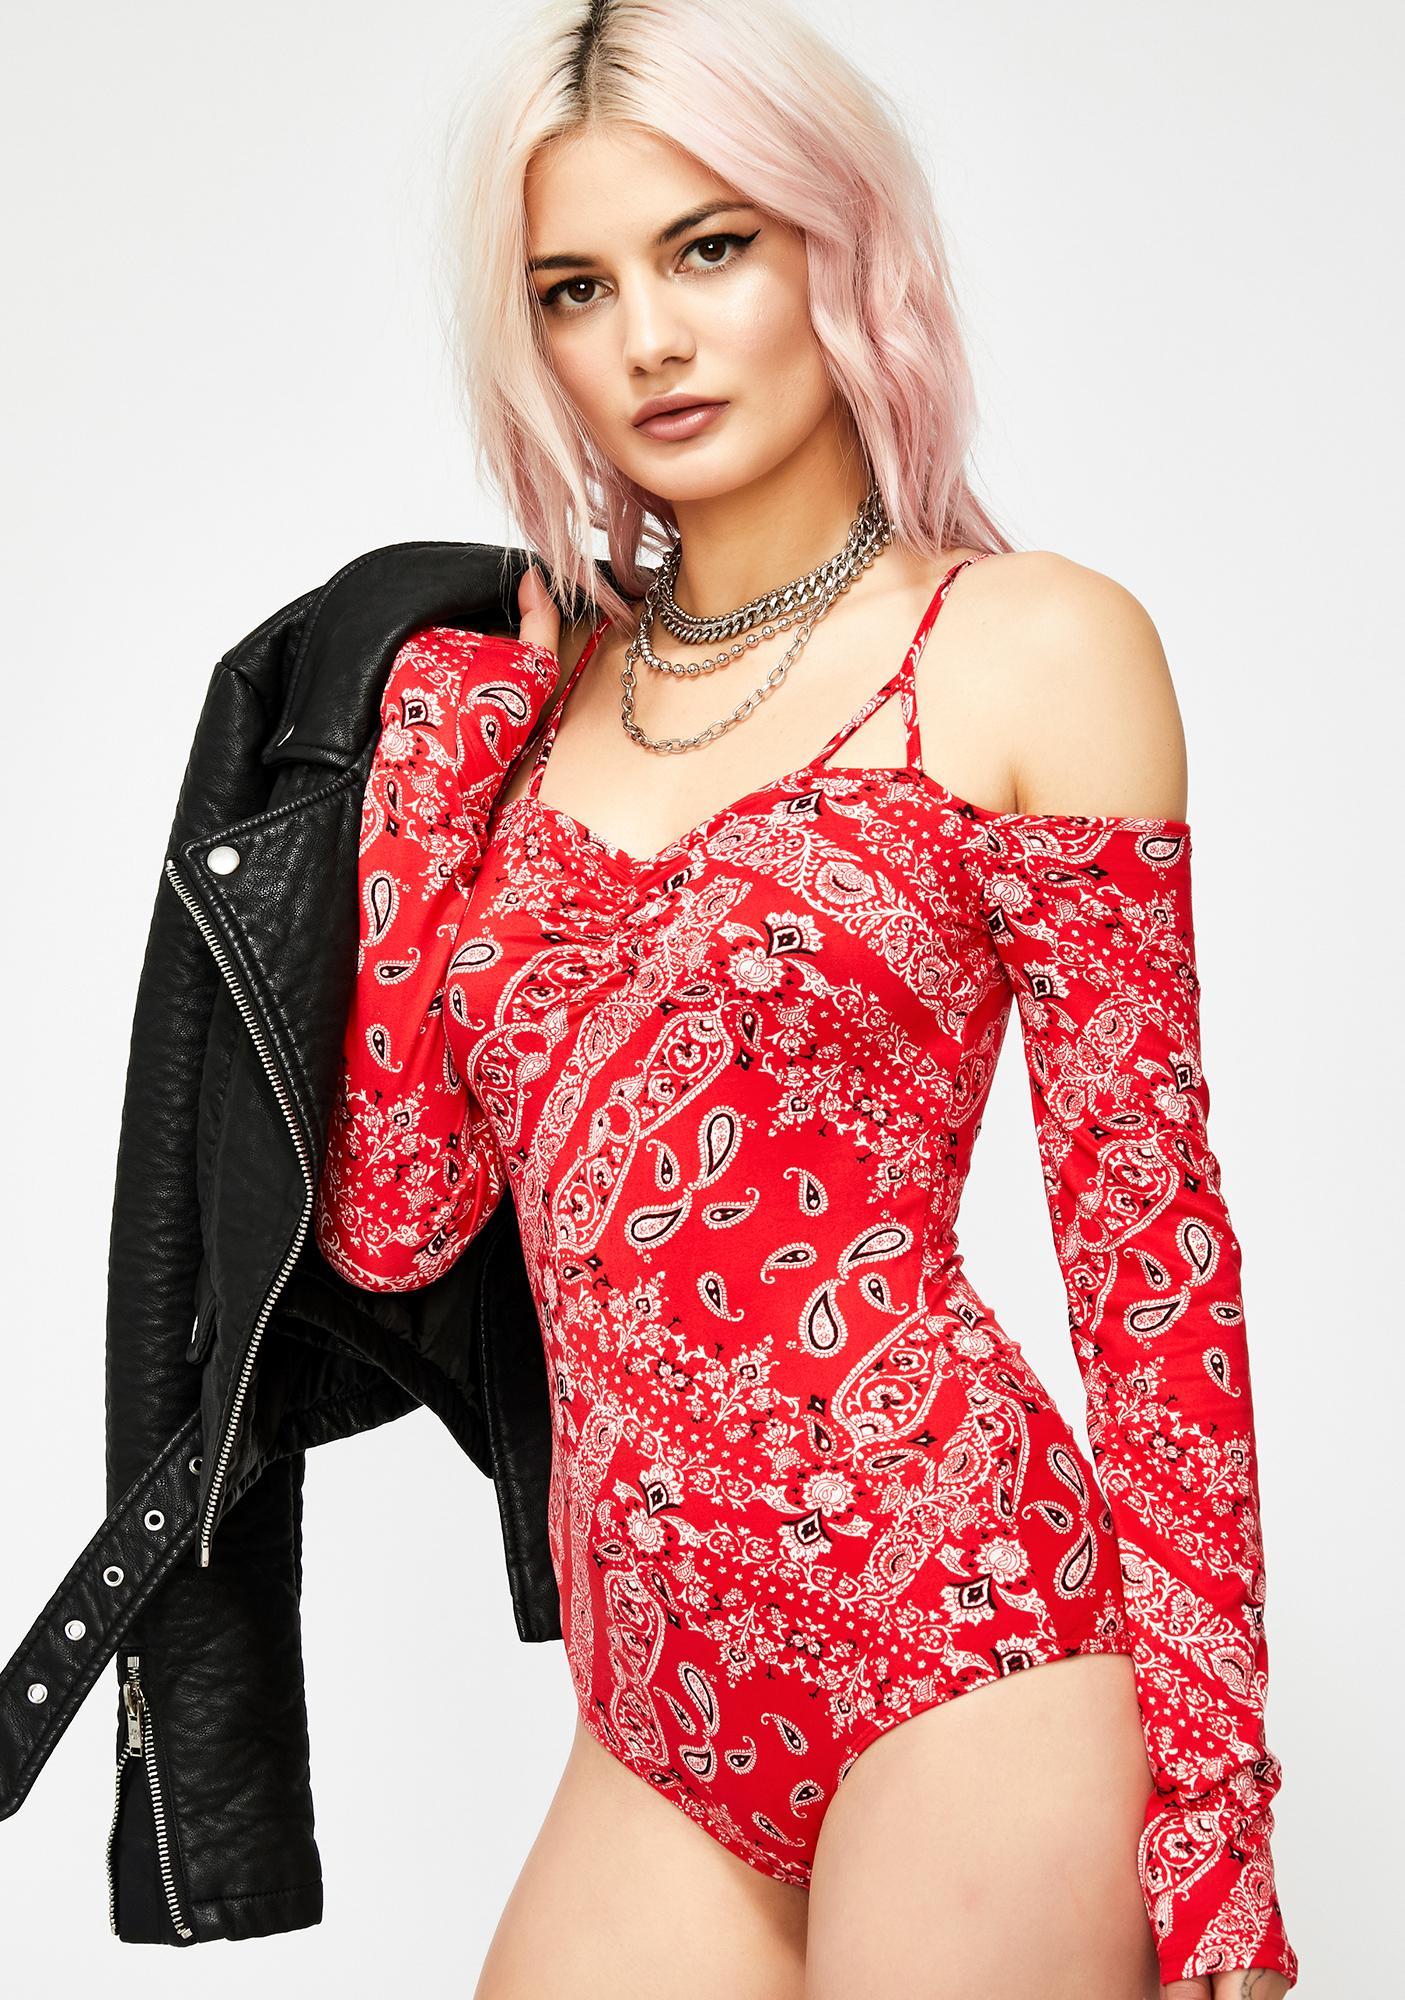 Scarlet Love Thief Bandana Bodysuit